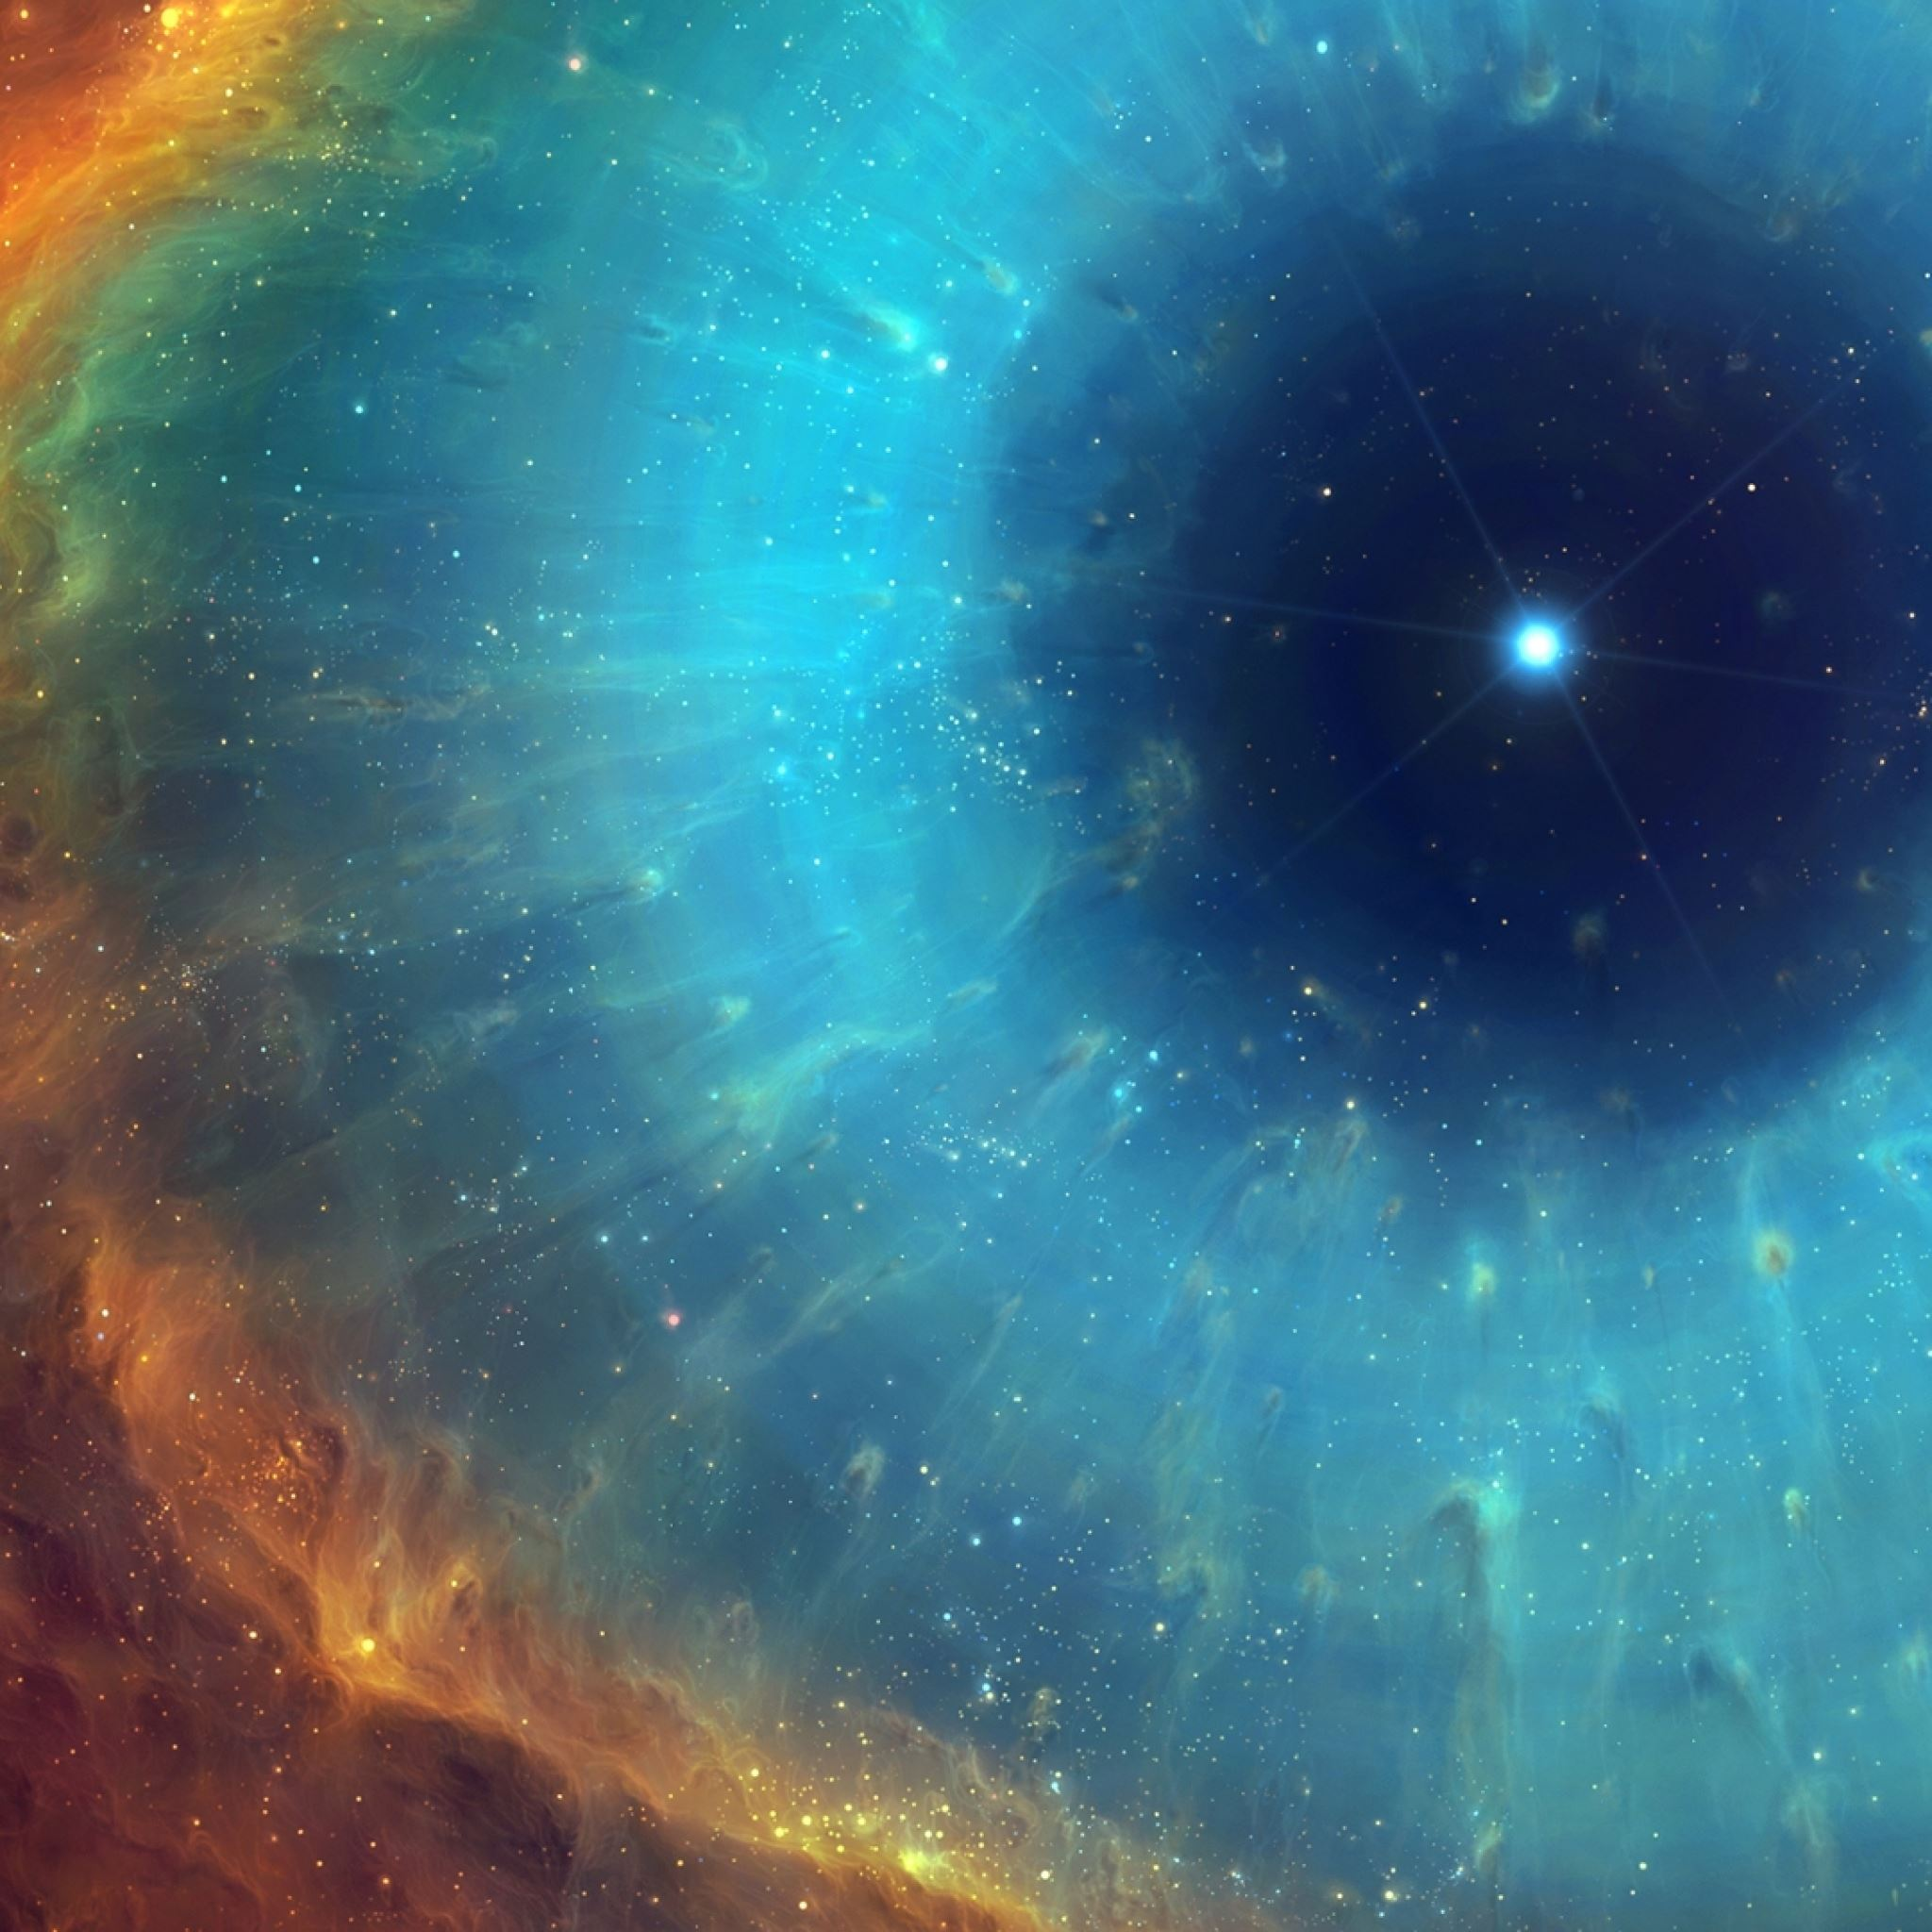 R Wallpaper Download: Art Space Nebula Star Energy IPad Air Wallpaper Download